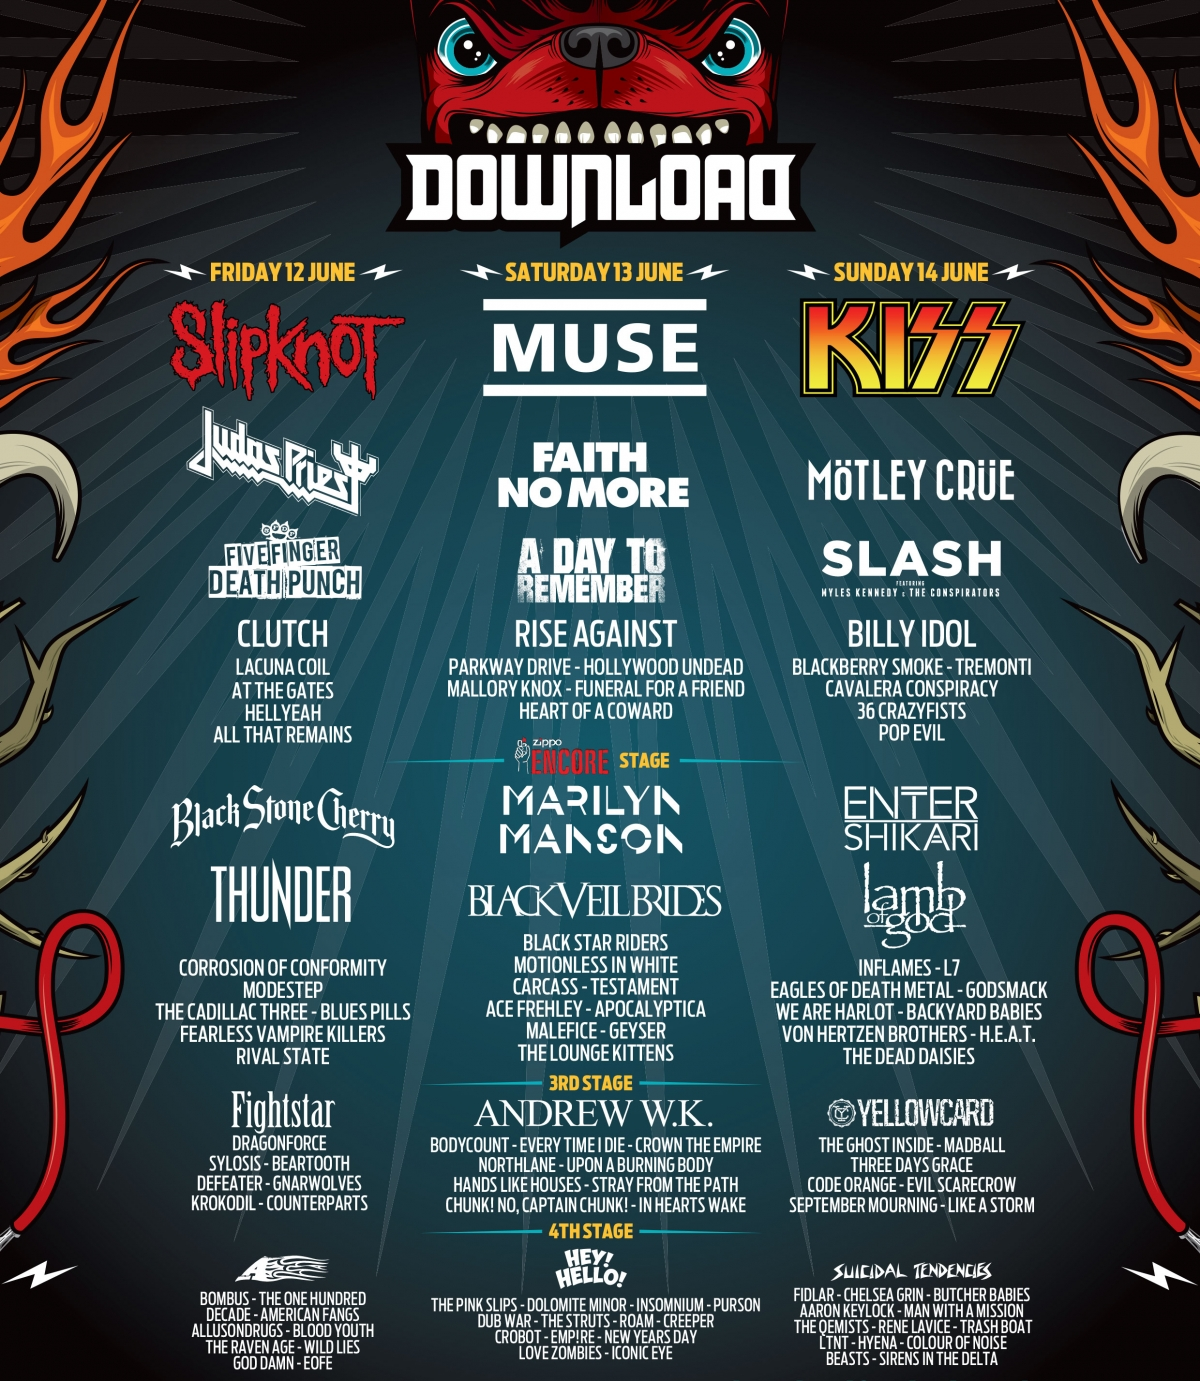 Concerts-metal calendar   download festival 2015 12/06/2015 (3.